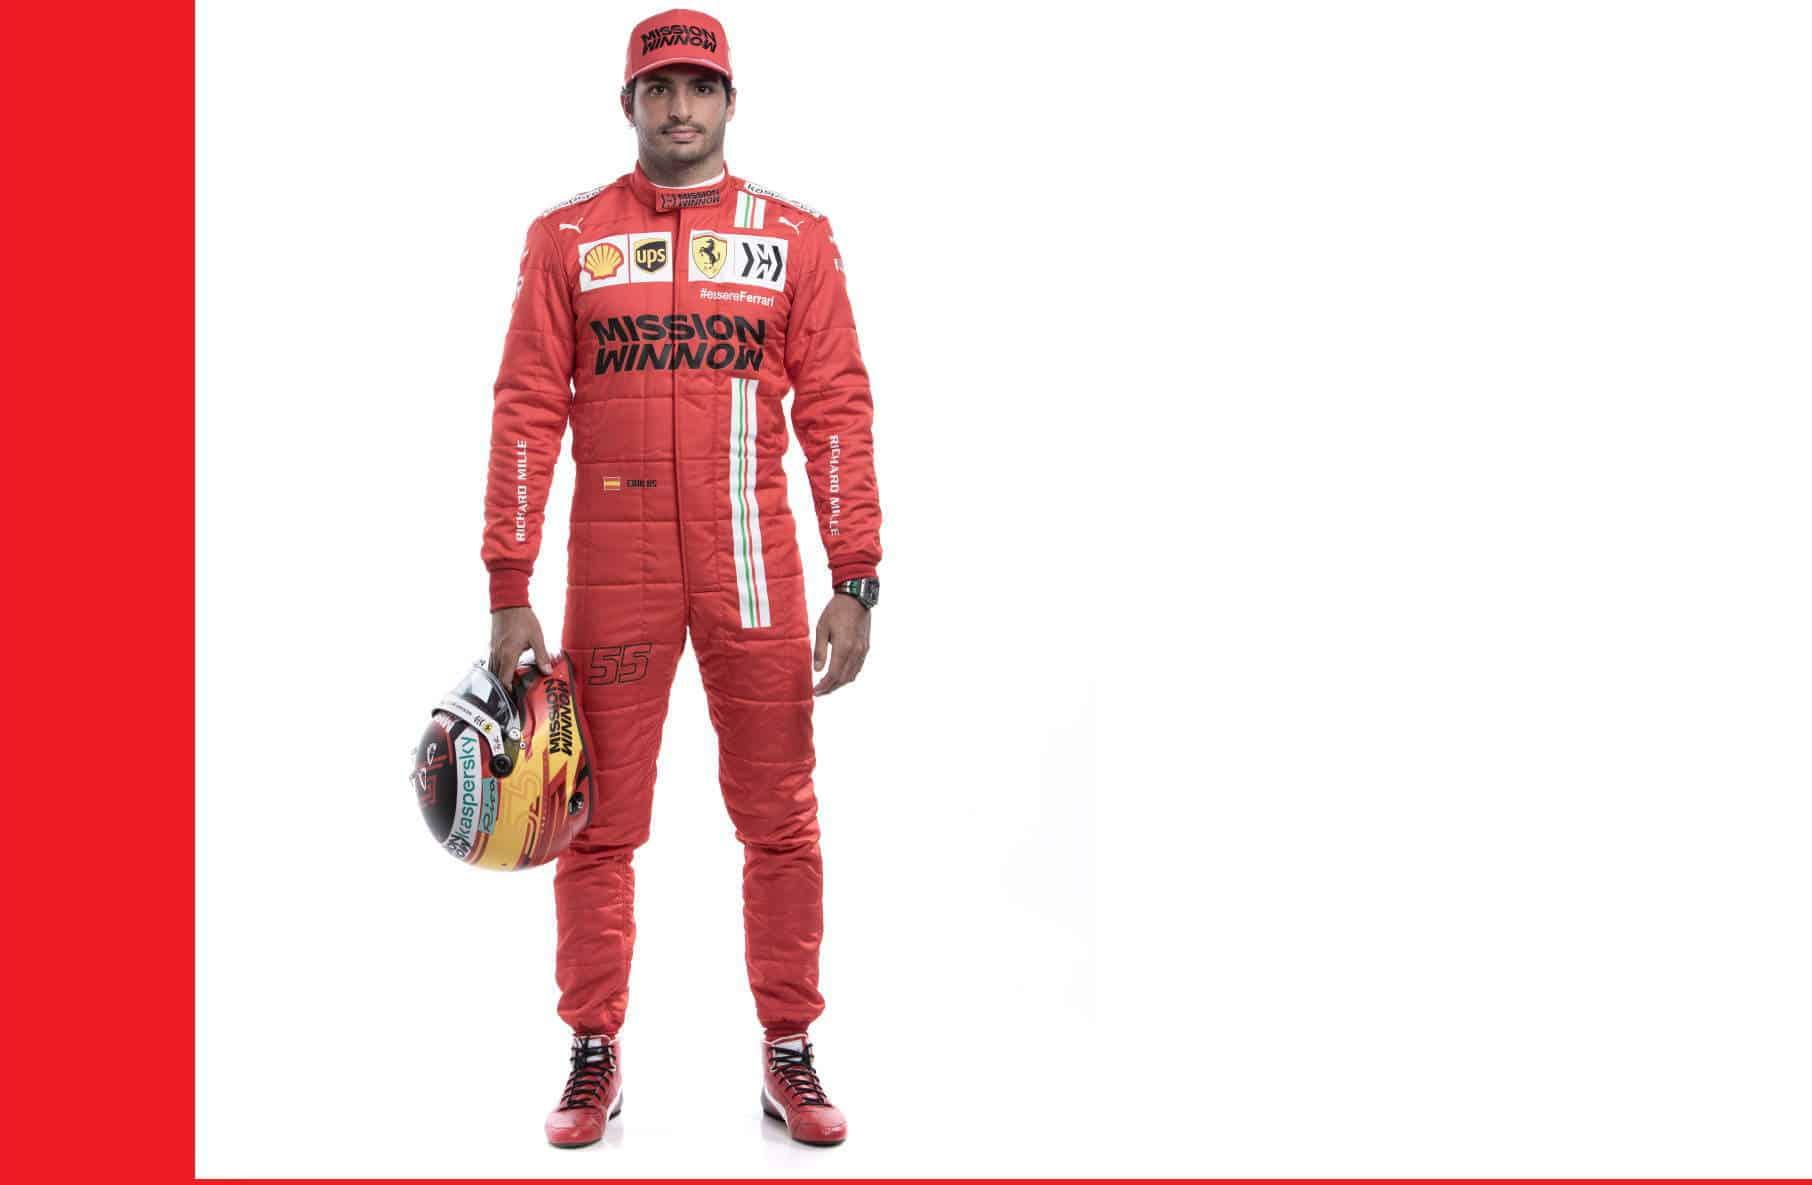 Carlos Sainz Ferrari F1 2021 new Photo Ferrari Edited by MAXF1net